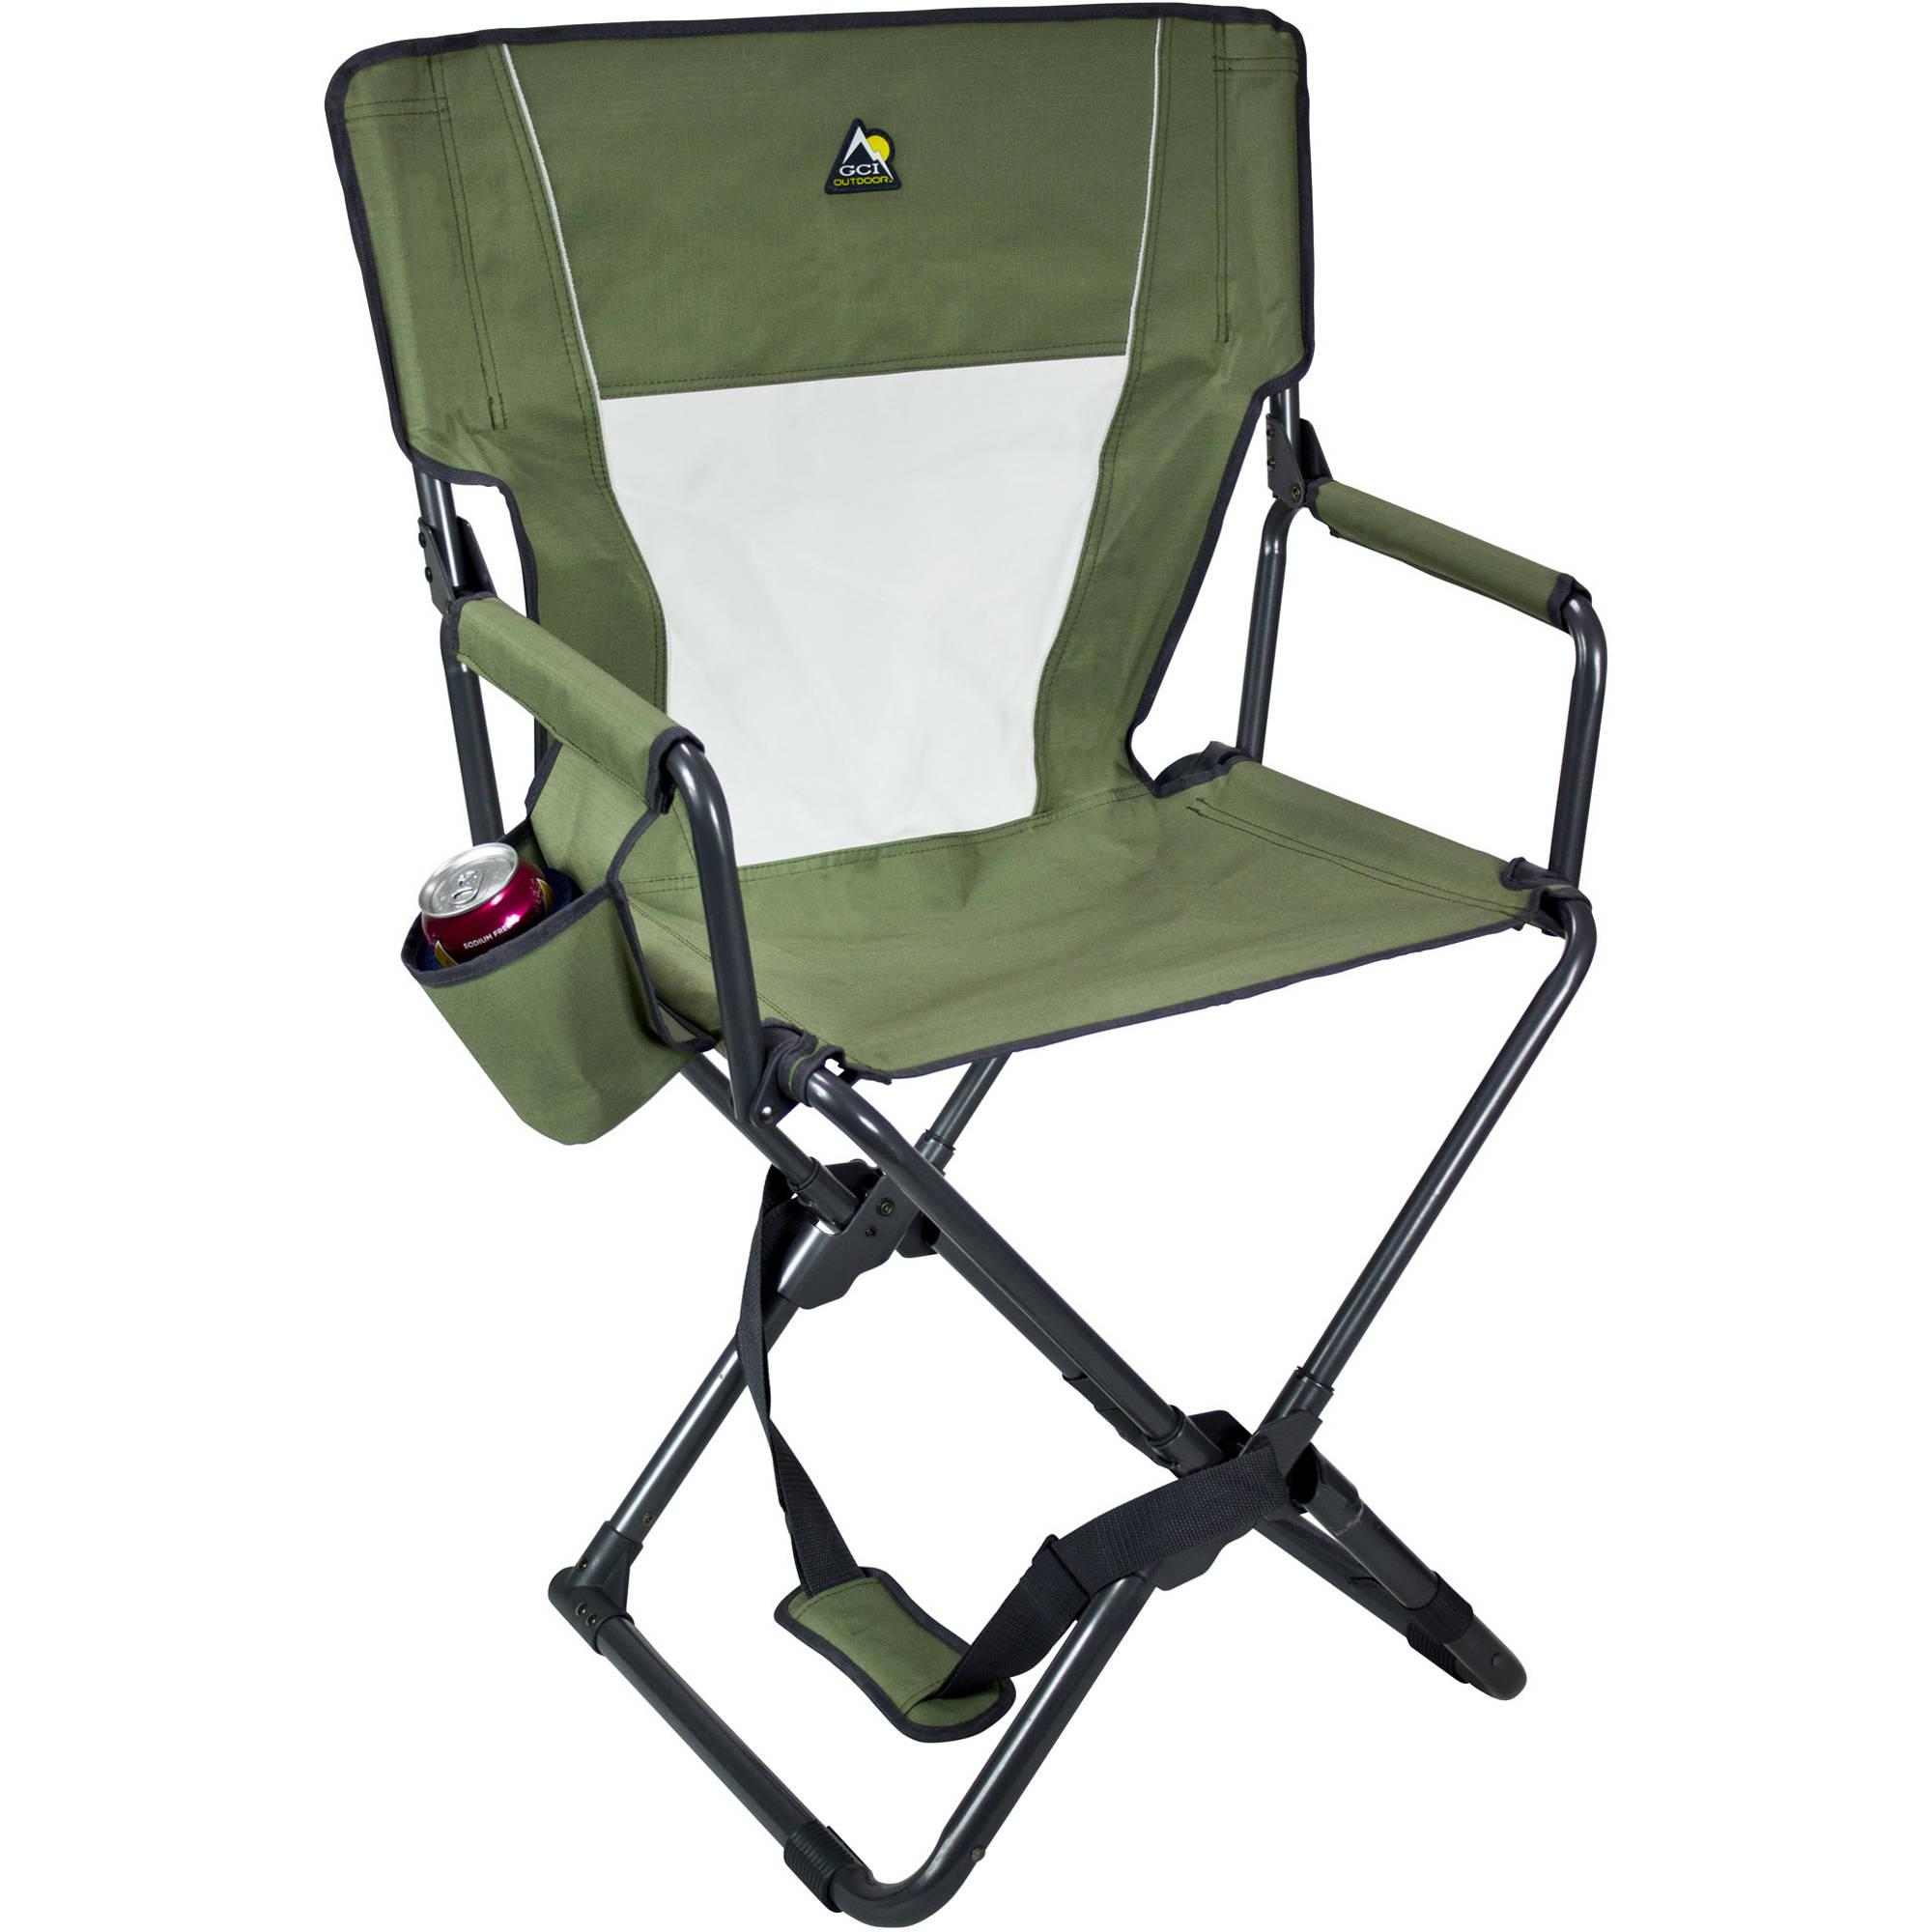 Gci Outdoor Xpress Director S Chair Loden Green 24273 B Amp H